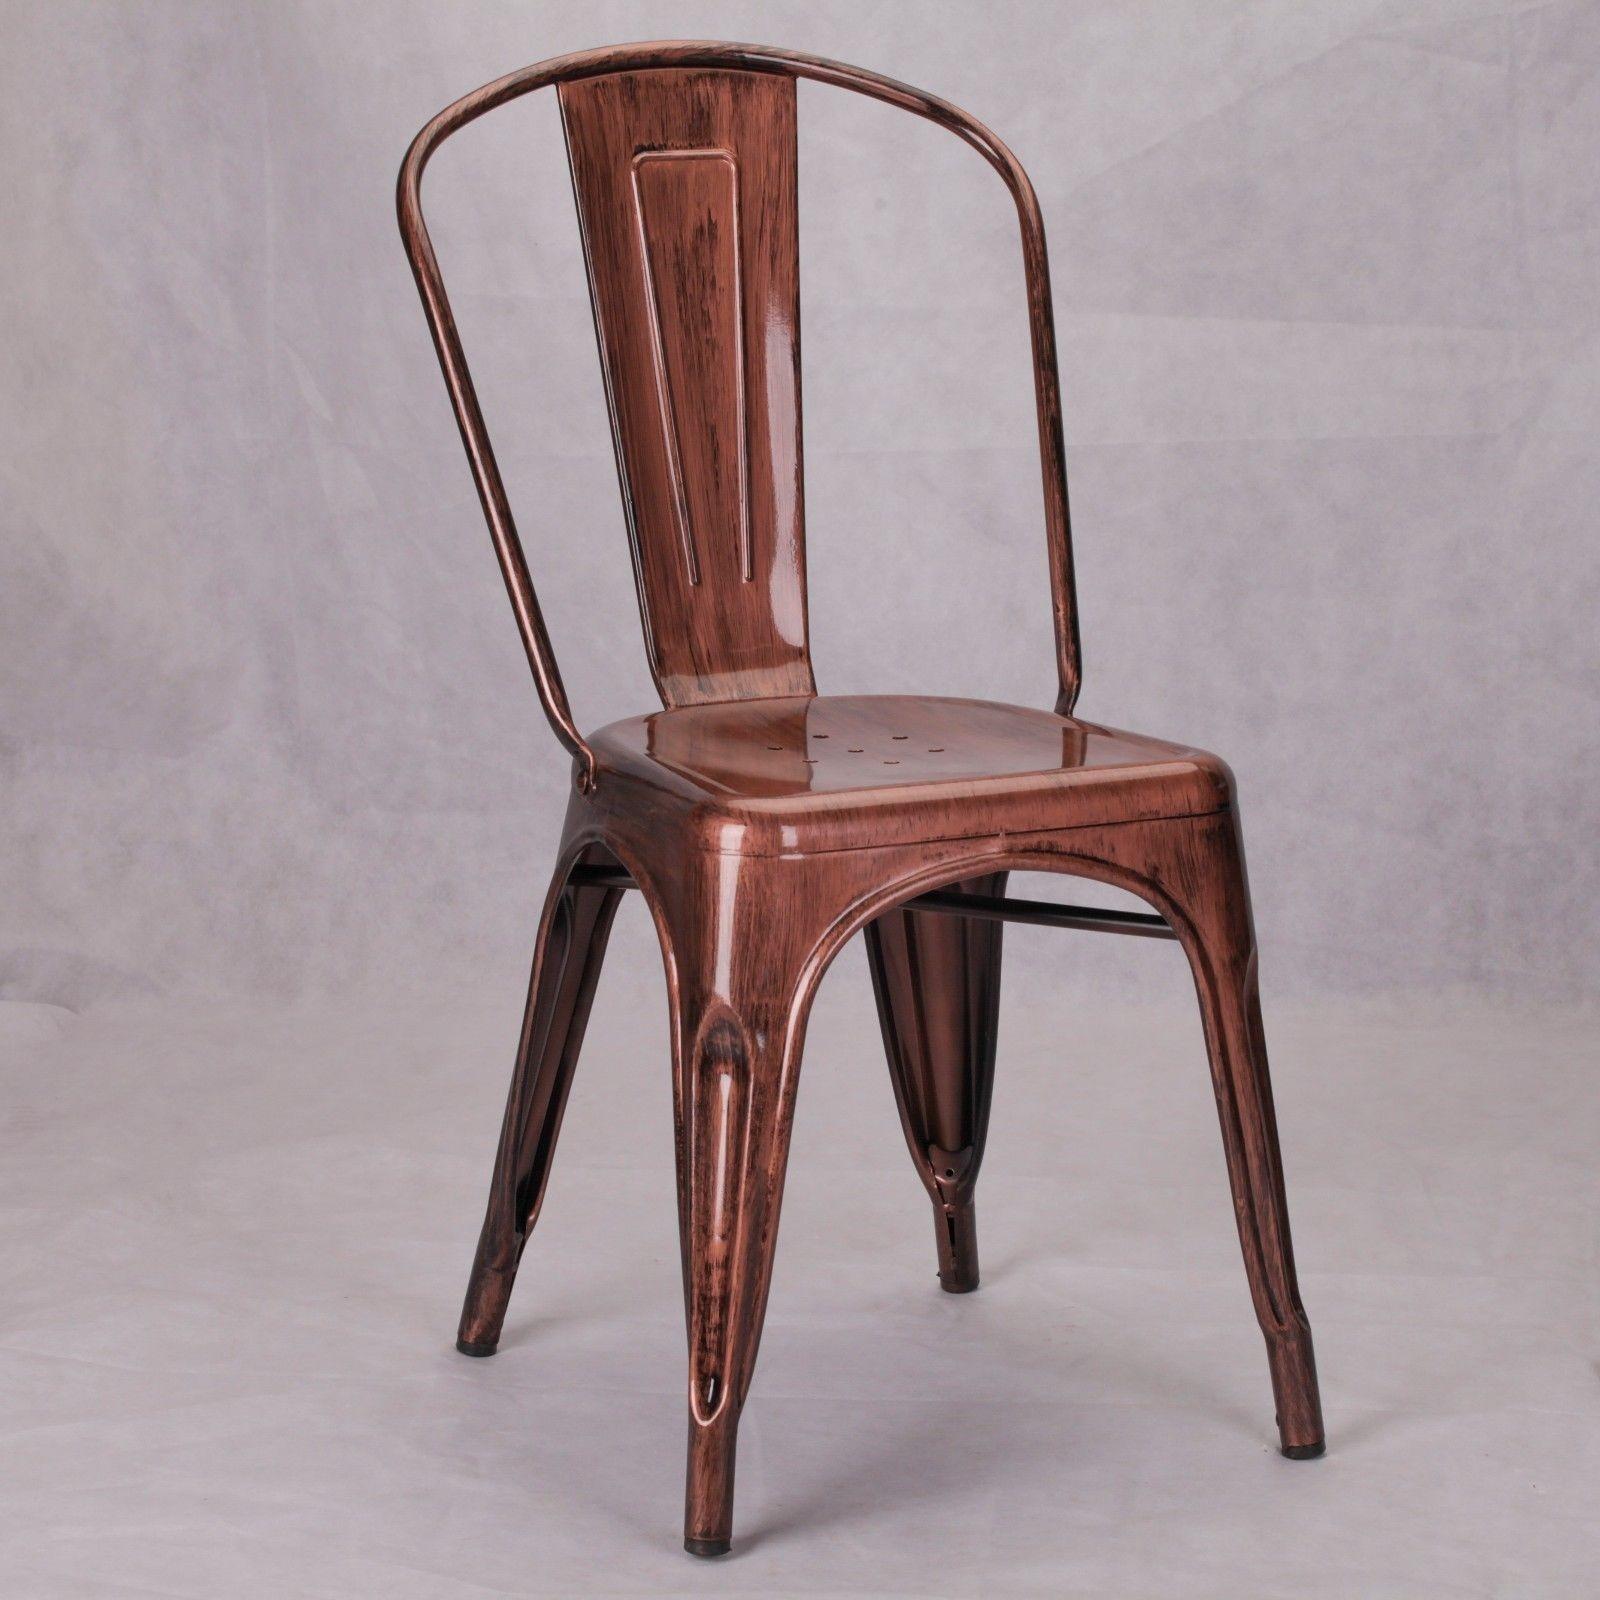 Metal Copper Chair -  www.la-maison-chic.co.uk